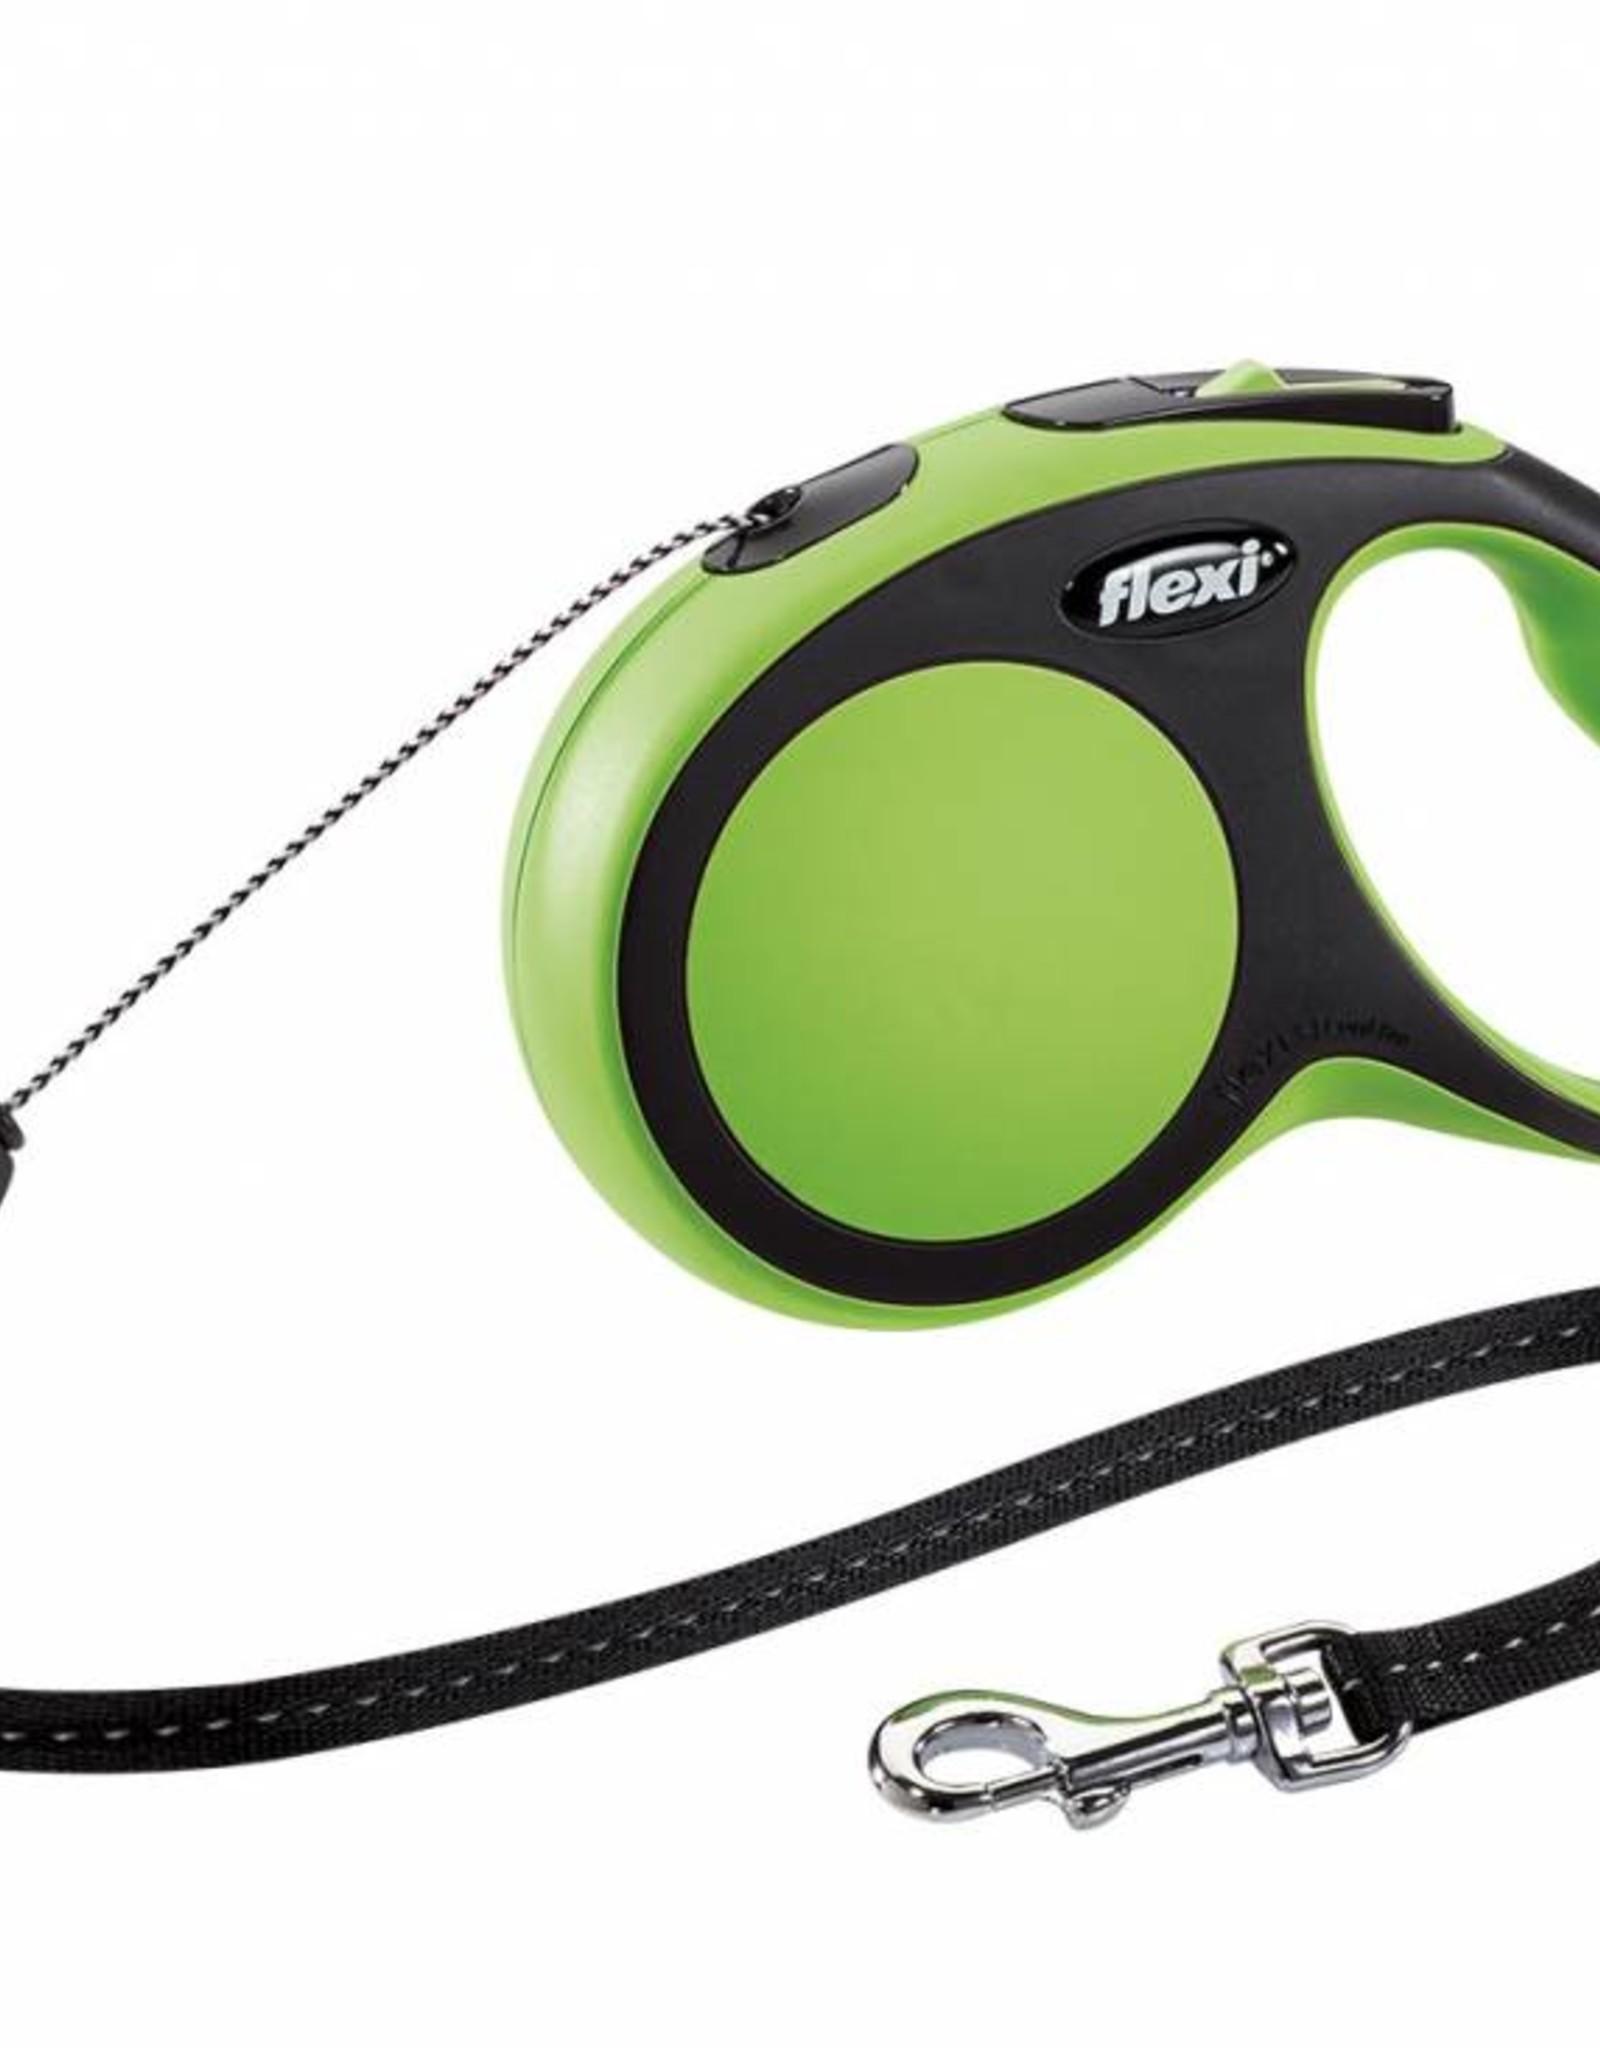 Flexi Extending Dog Lead, Comfort Small, Cord 8m